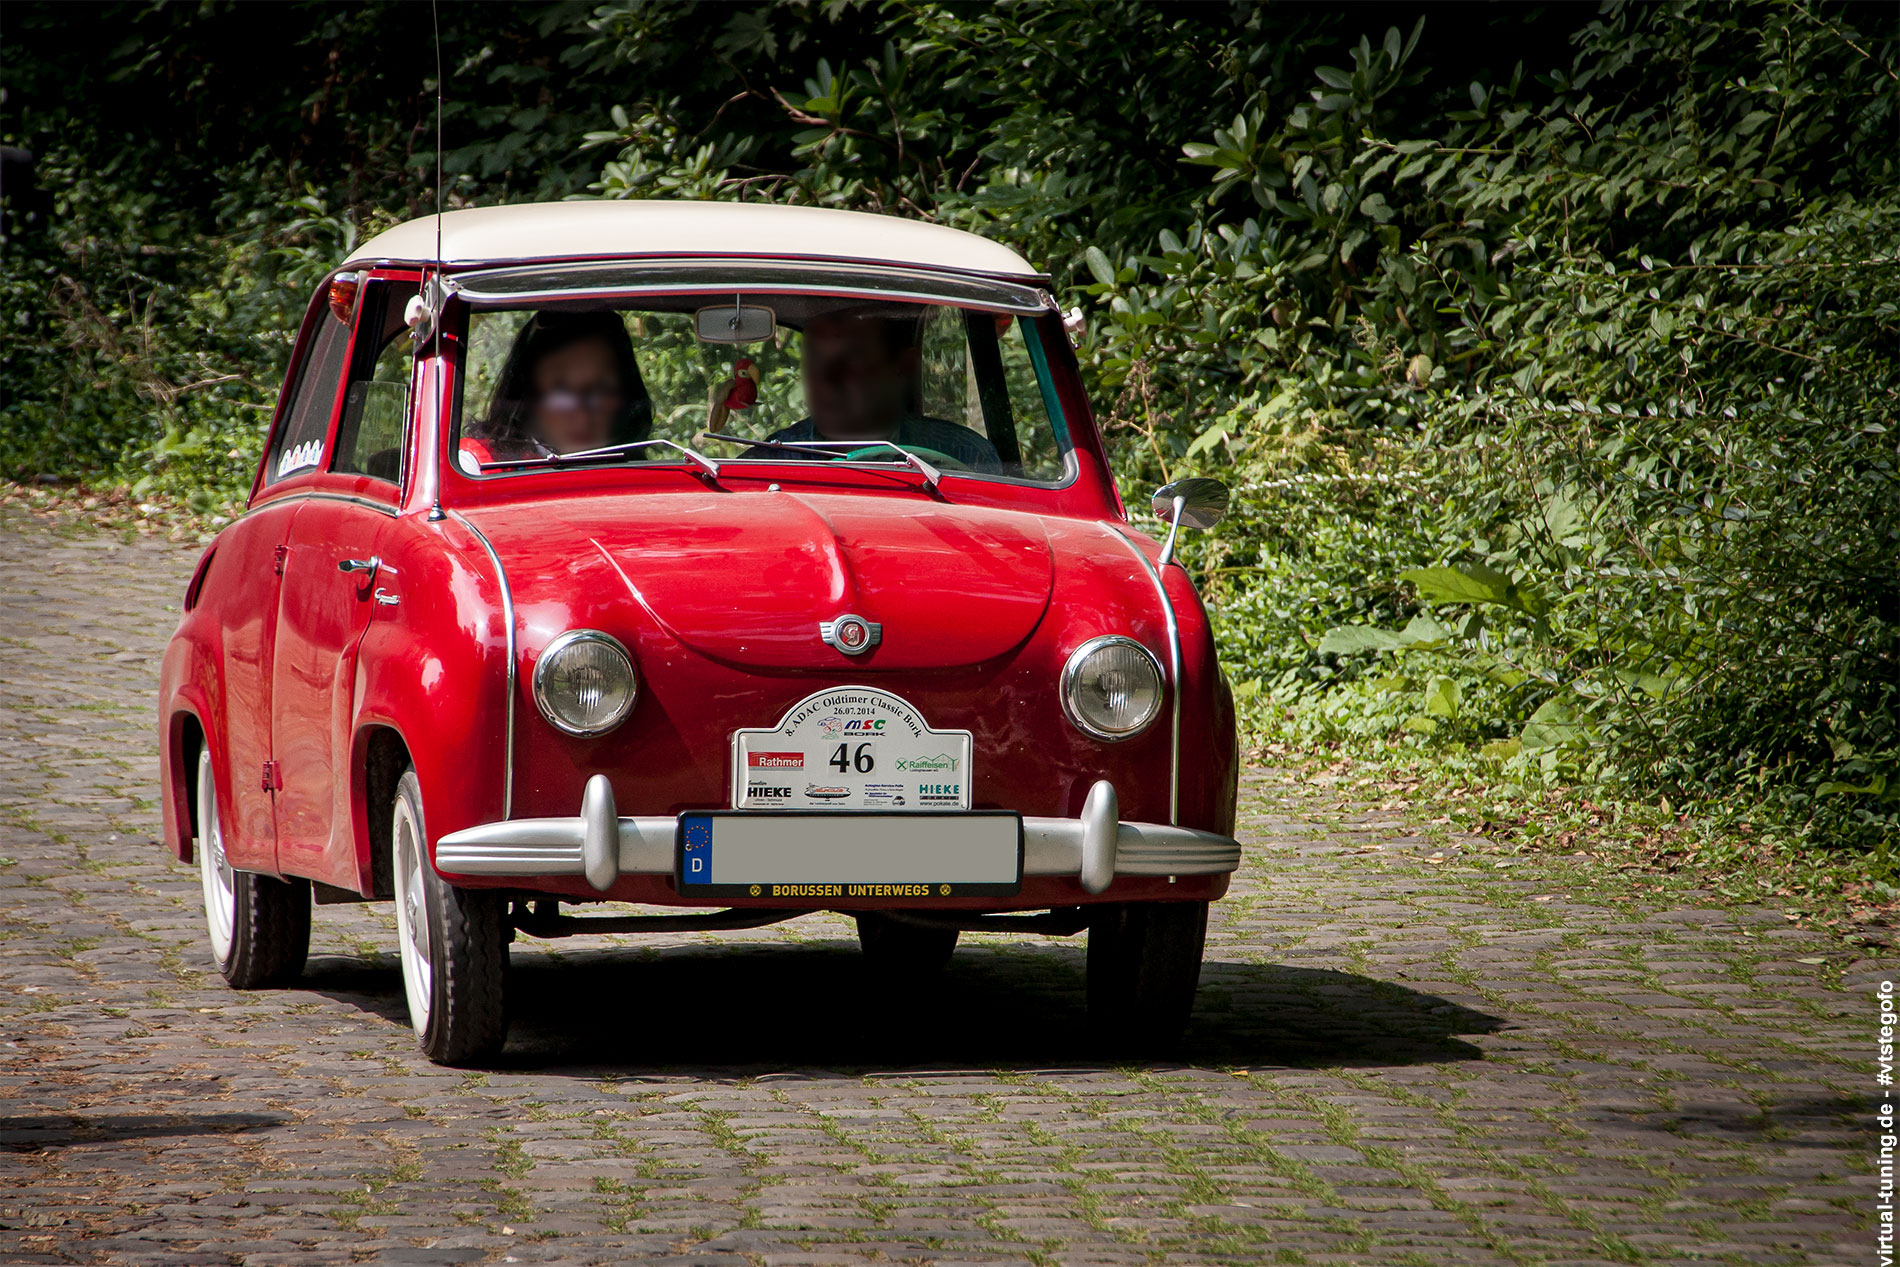 Goggomobil - 8. ADAC Oldtimer - Classic Bork (07.2014)